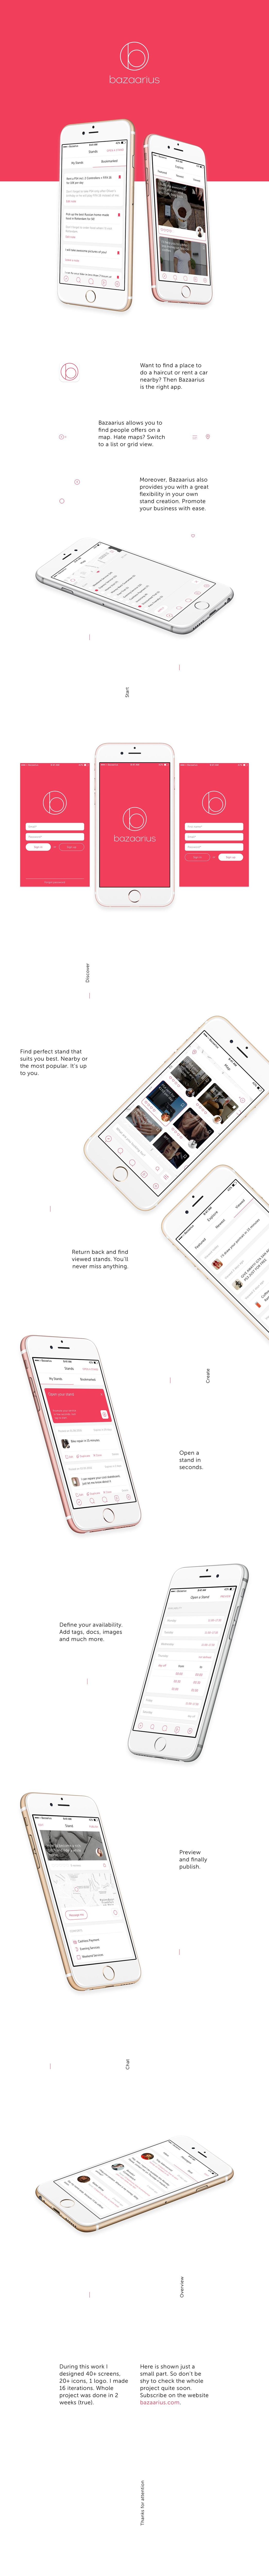 Bazaarius | Logo and iOS App Design on Behance